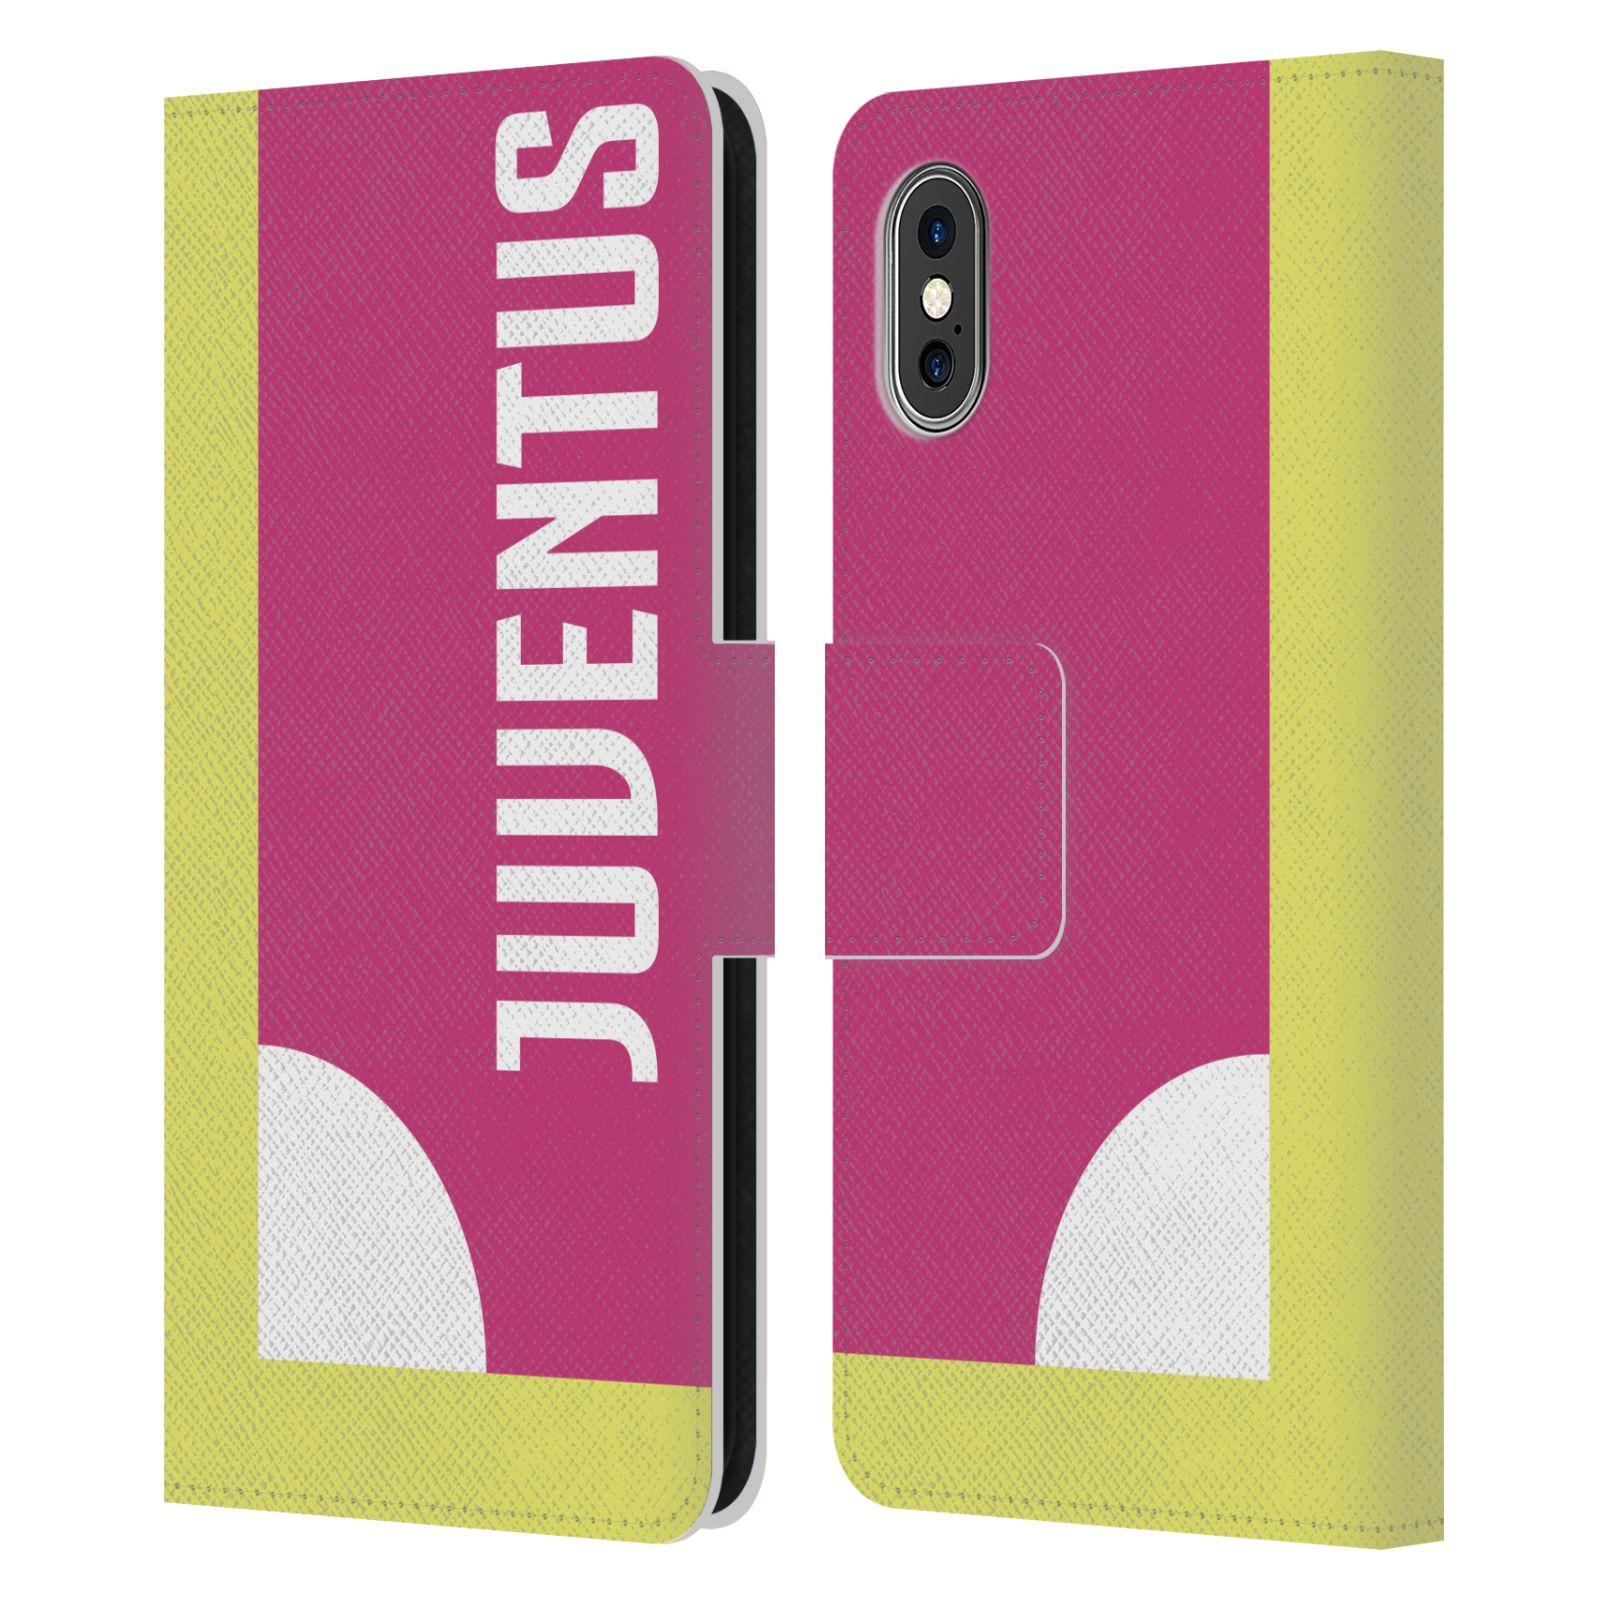 JUVENTUS-FC-2018-19-COLOUR-BLOCKING-LEATHER-BOOK-CASE-FOR-APPLE-iPHONE-PHONES